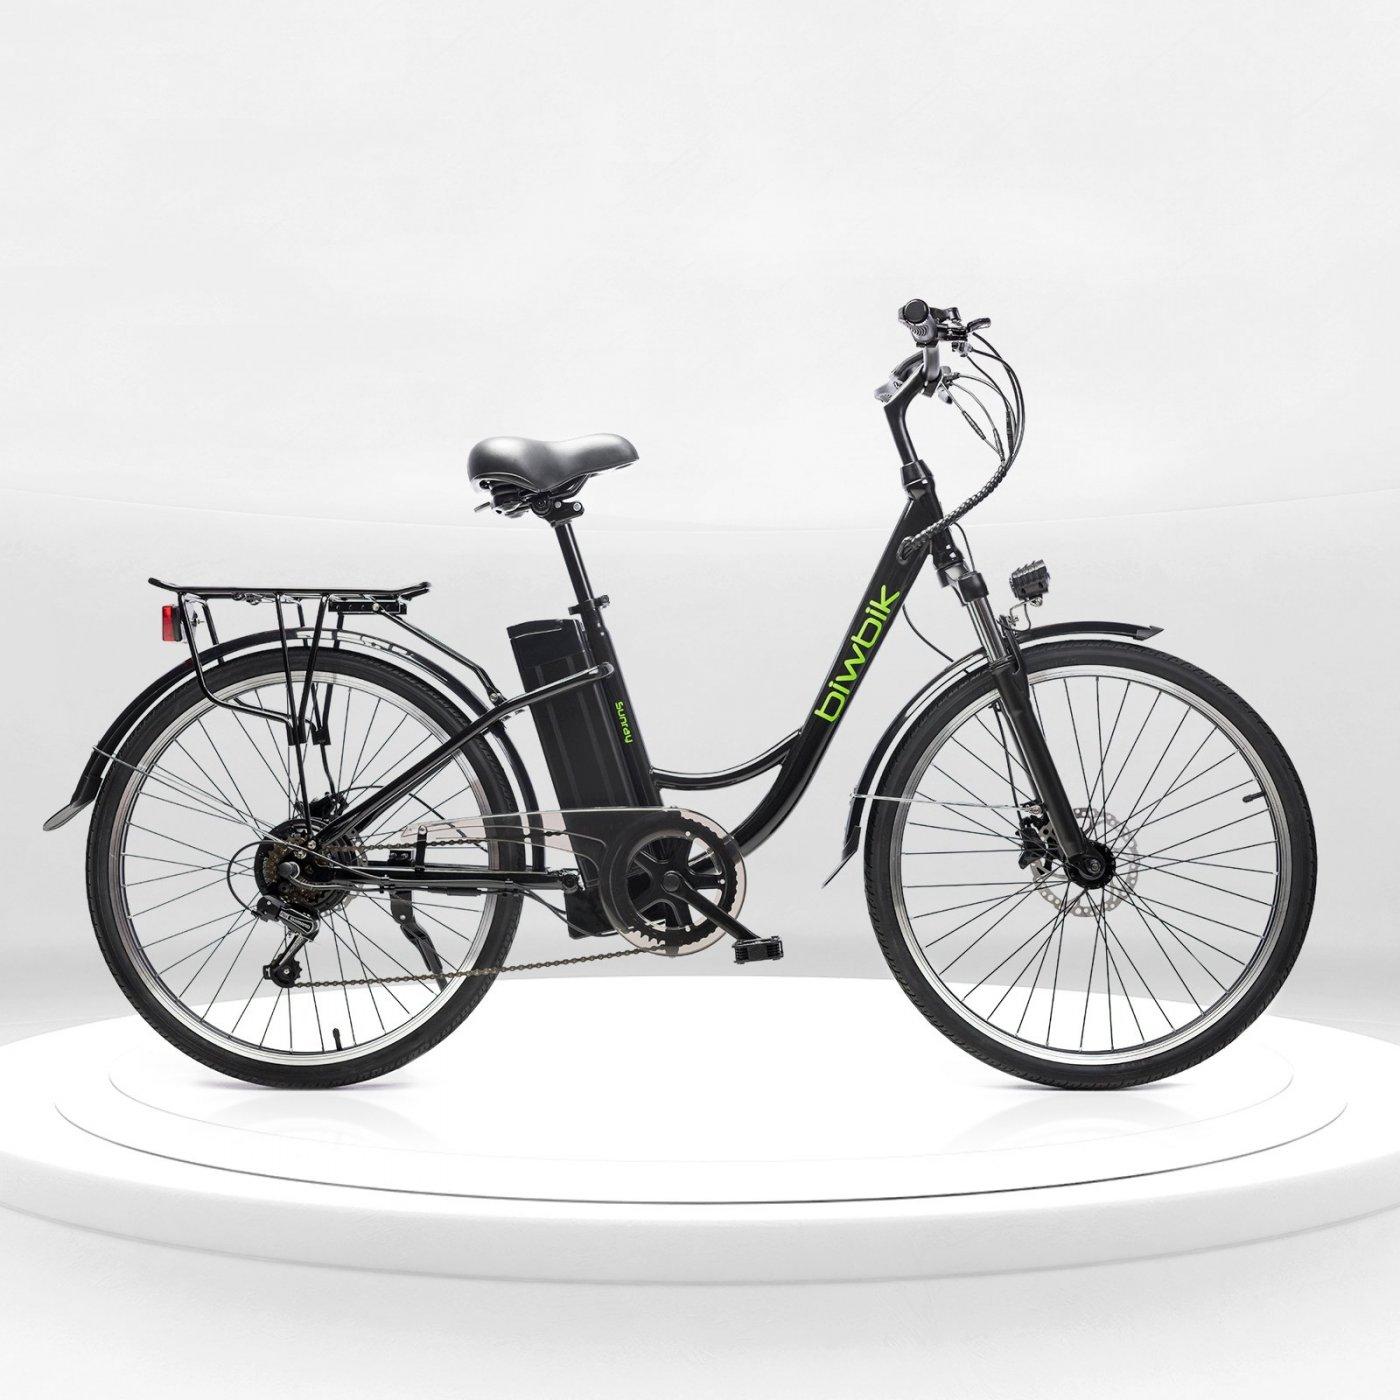 Biwbik Sunray black electric touring bike